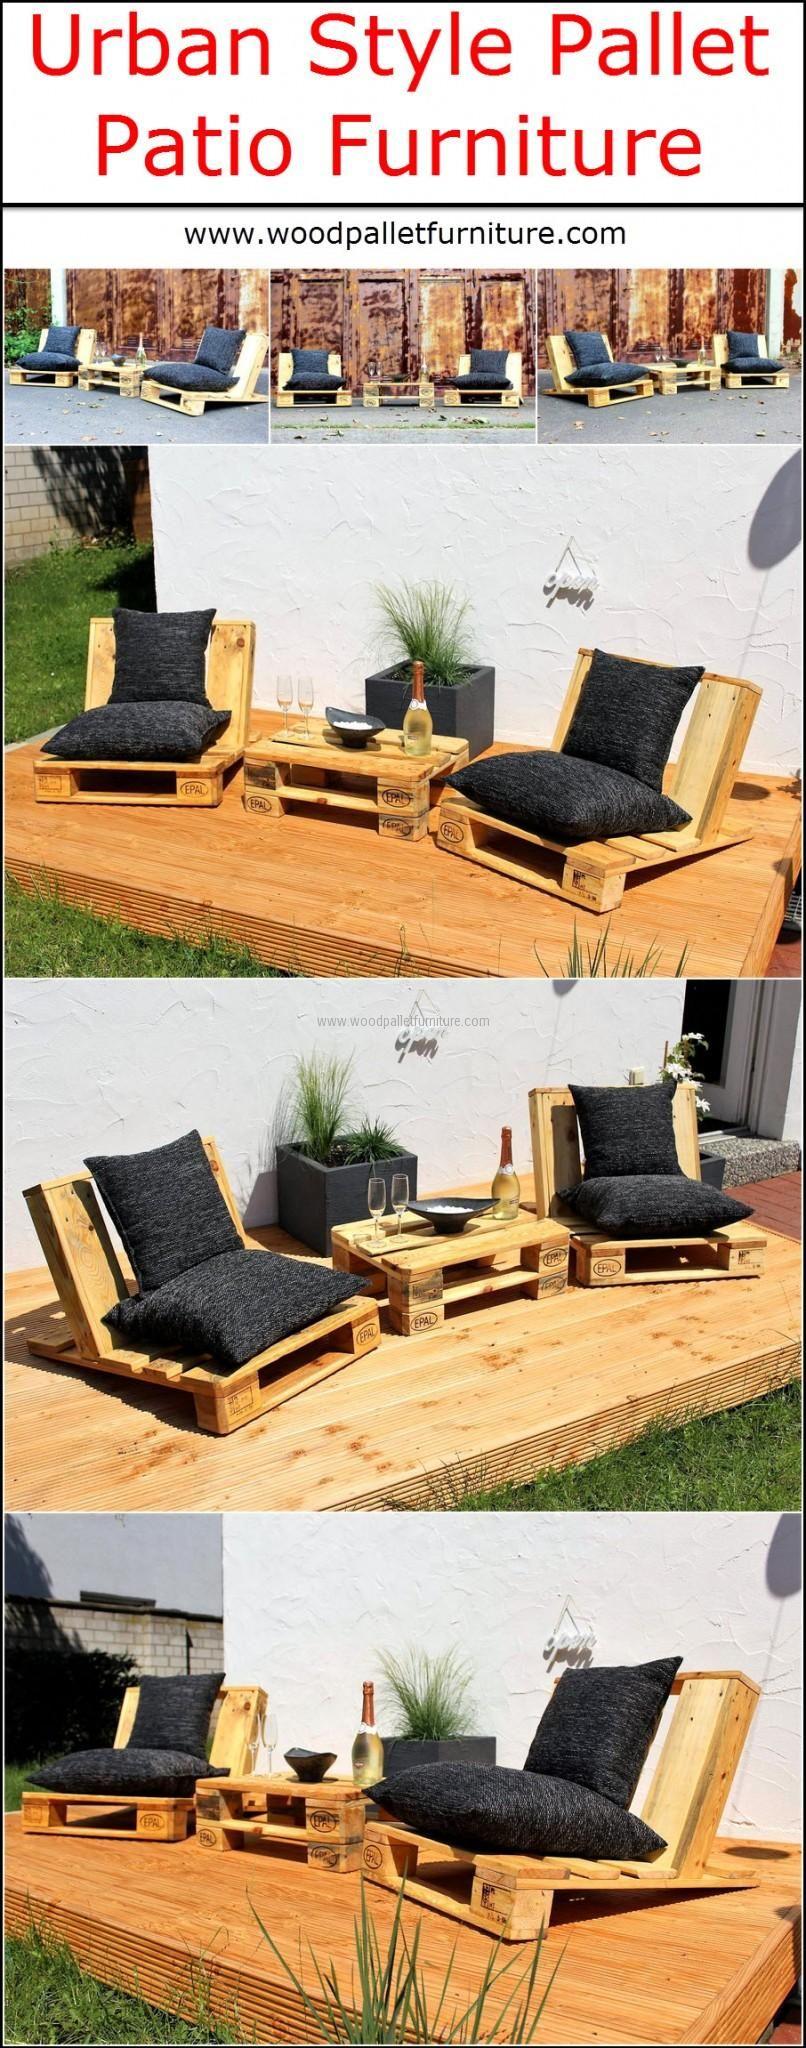 Urban Style Pallet Patio Furniture Idea